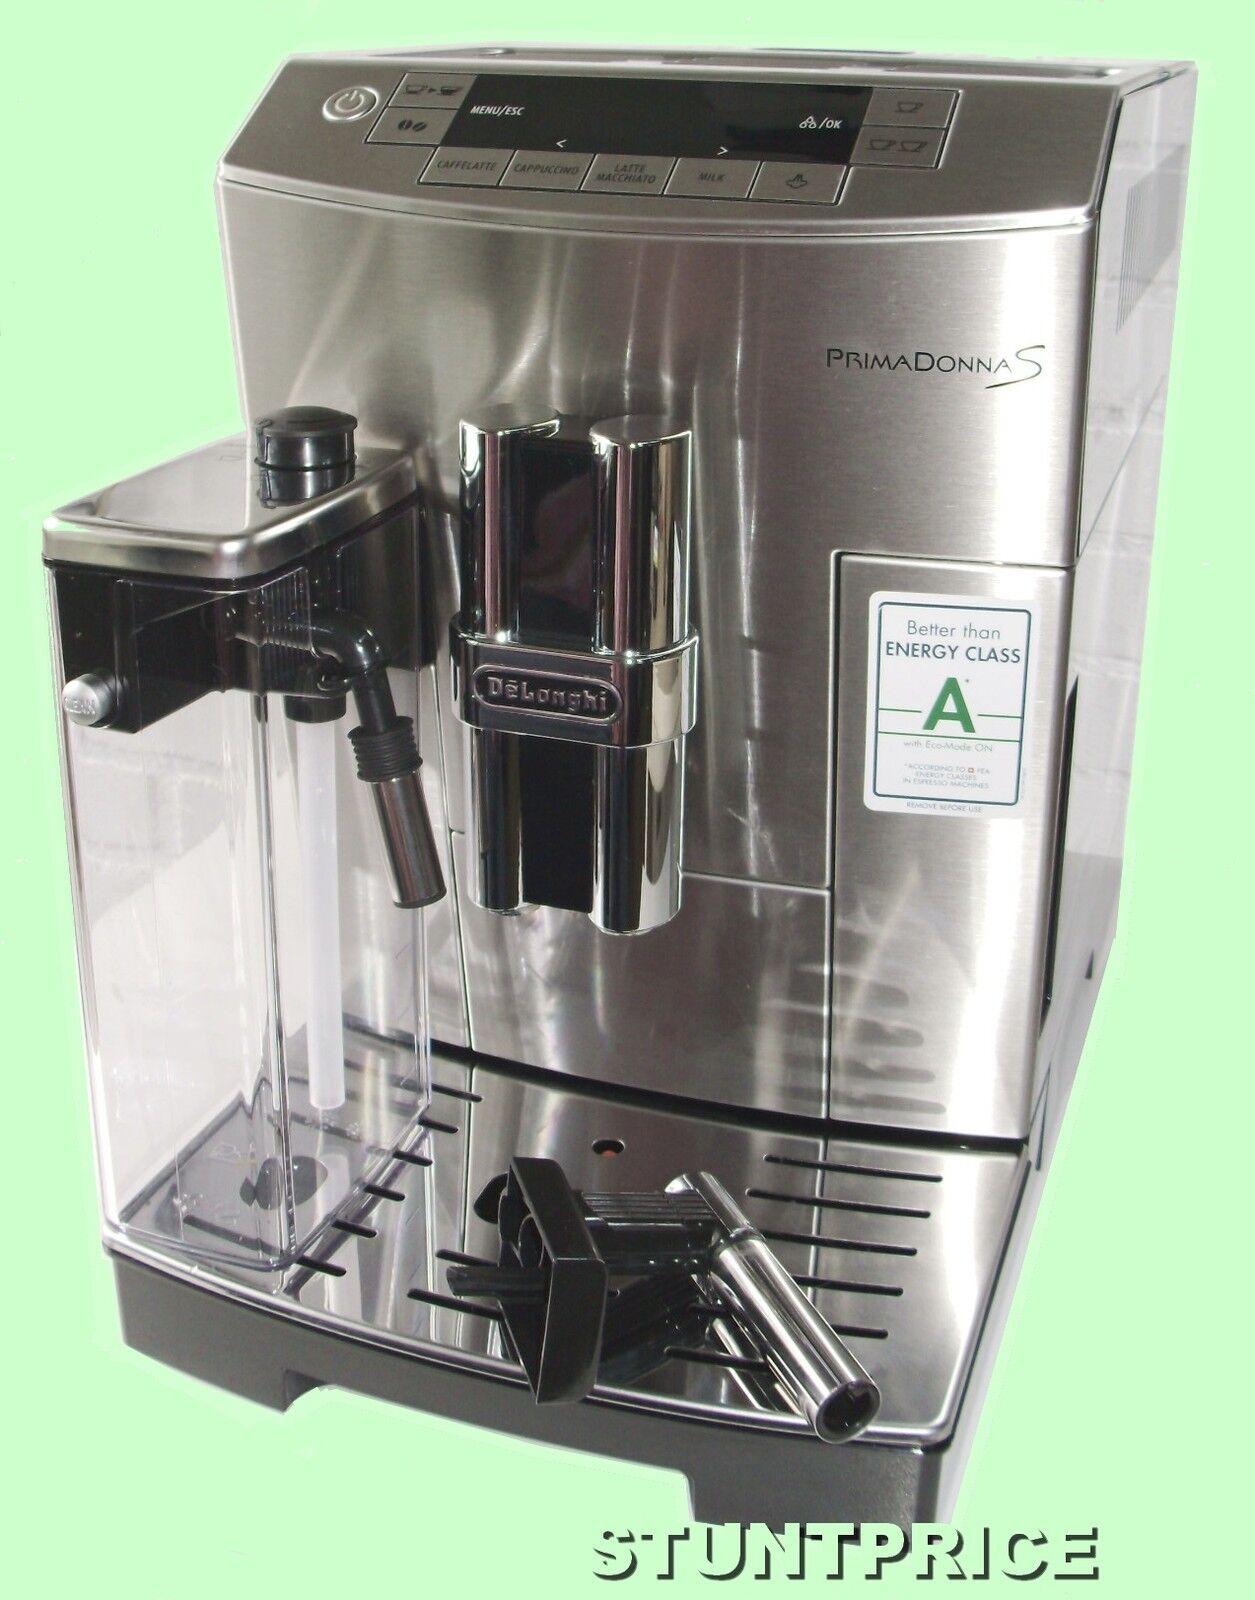 delonghi primadonna s kaffeevollautomat ecam 939 bez ge 8004399325692 ebay. Black Bedroom Furniture Sets. Home Design Ideas